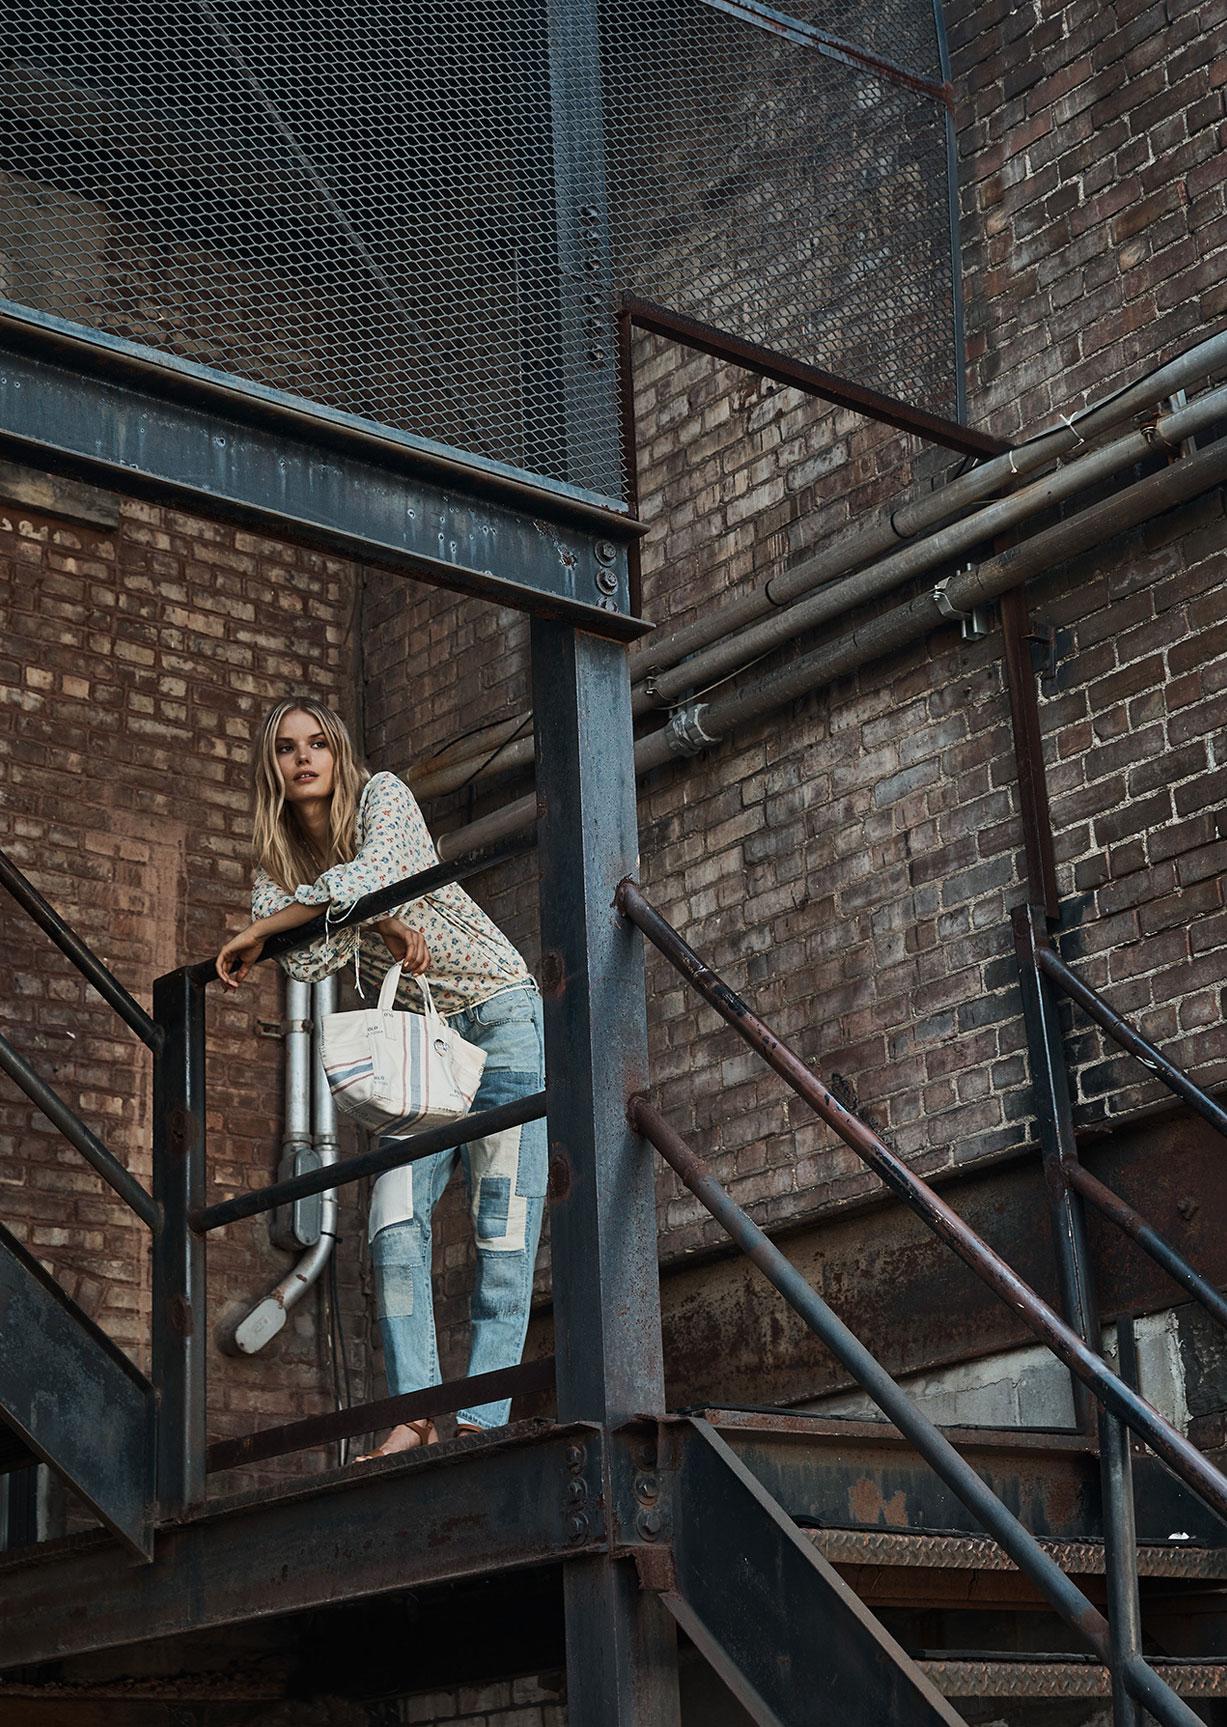 Алена Блум в Нью-Йорке / фото 09